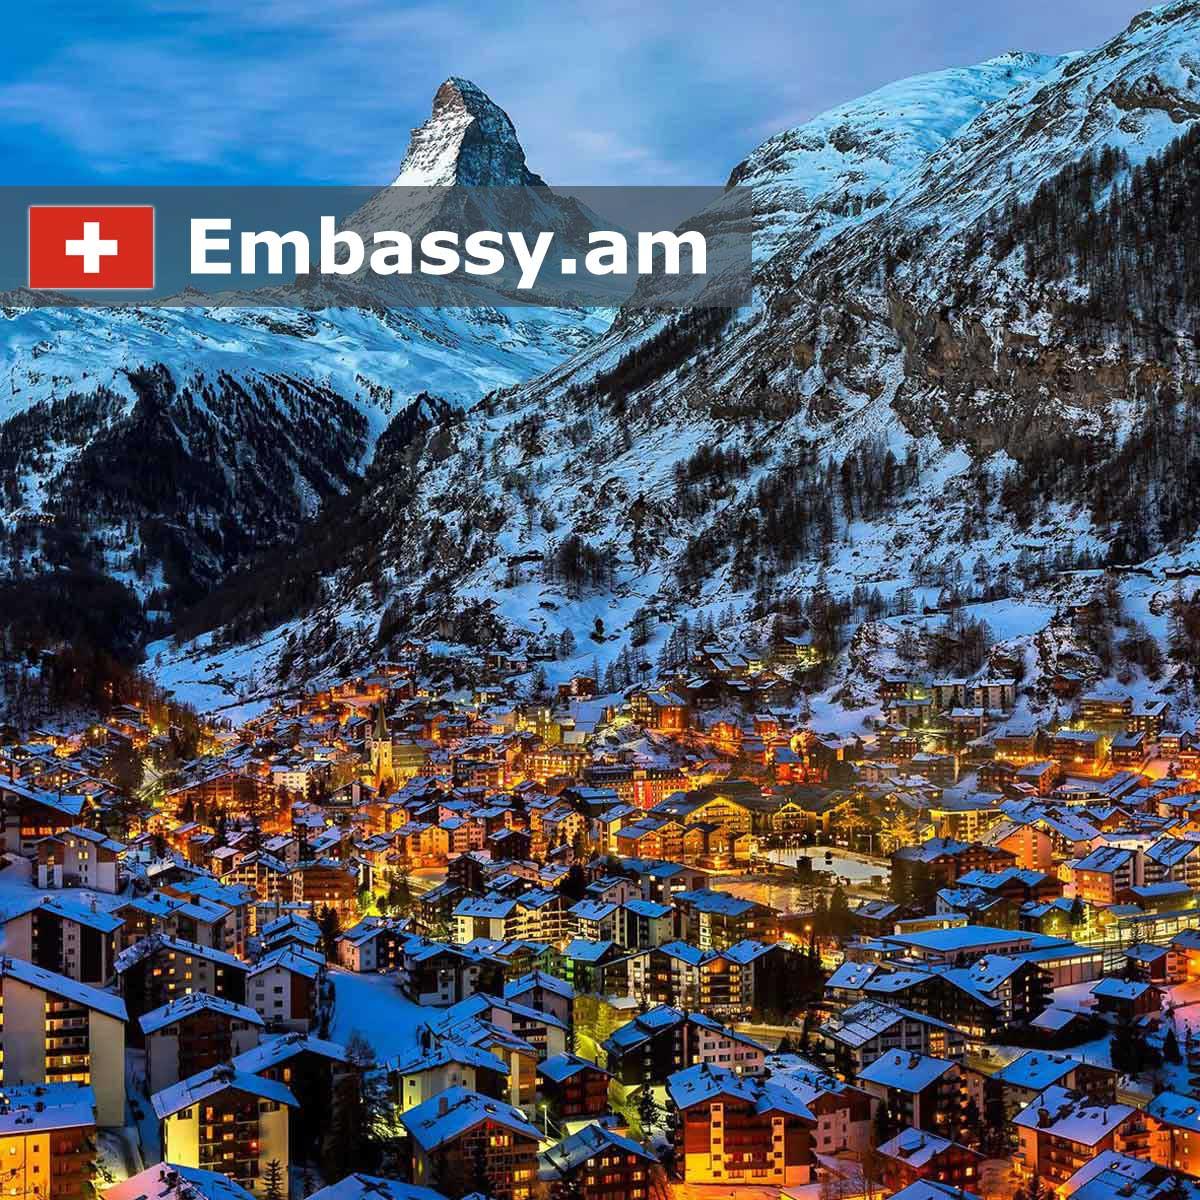 Zermatt - Hotels in Switzerland - Embassy.am